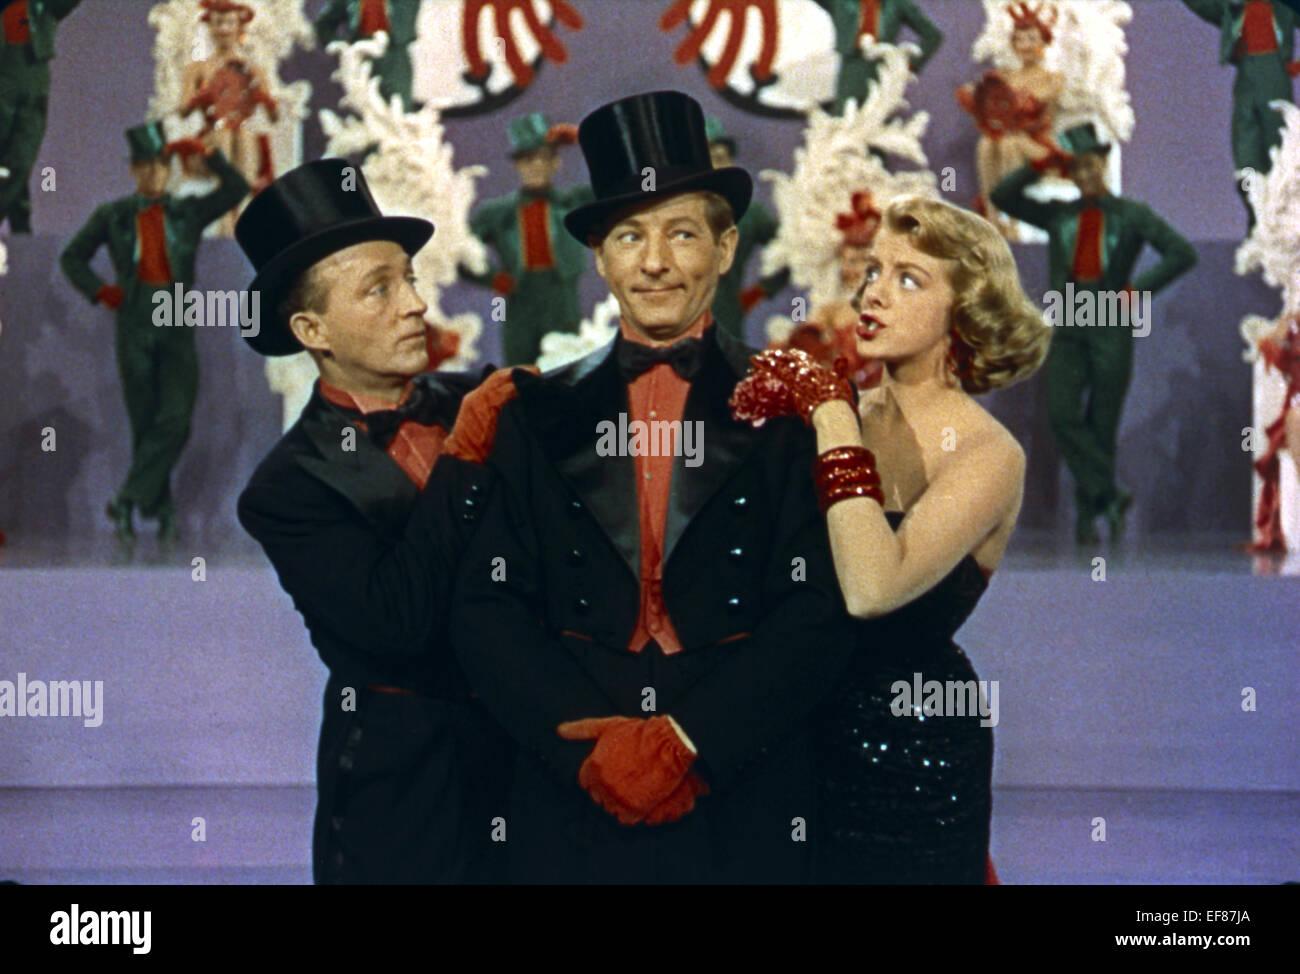 White Christmas 1954.Bing Crosby Danny Kaye Rosemary Clooney White Christmas